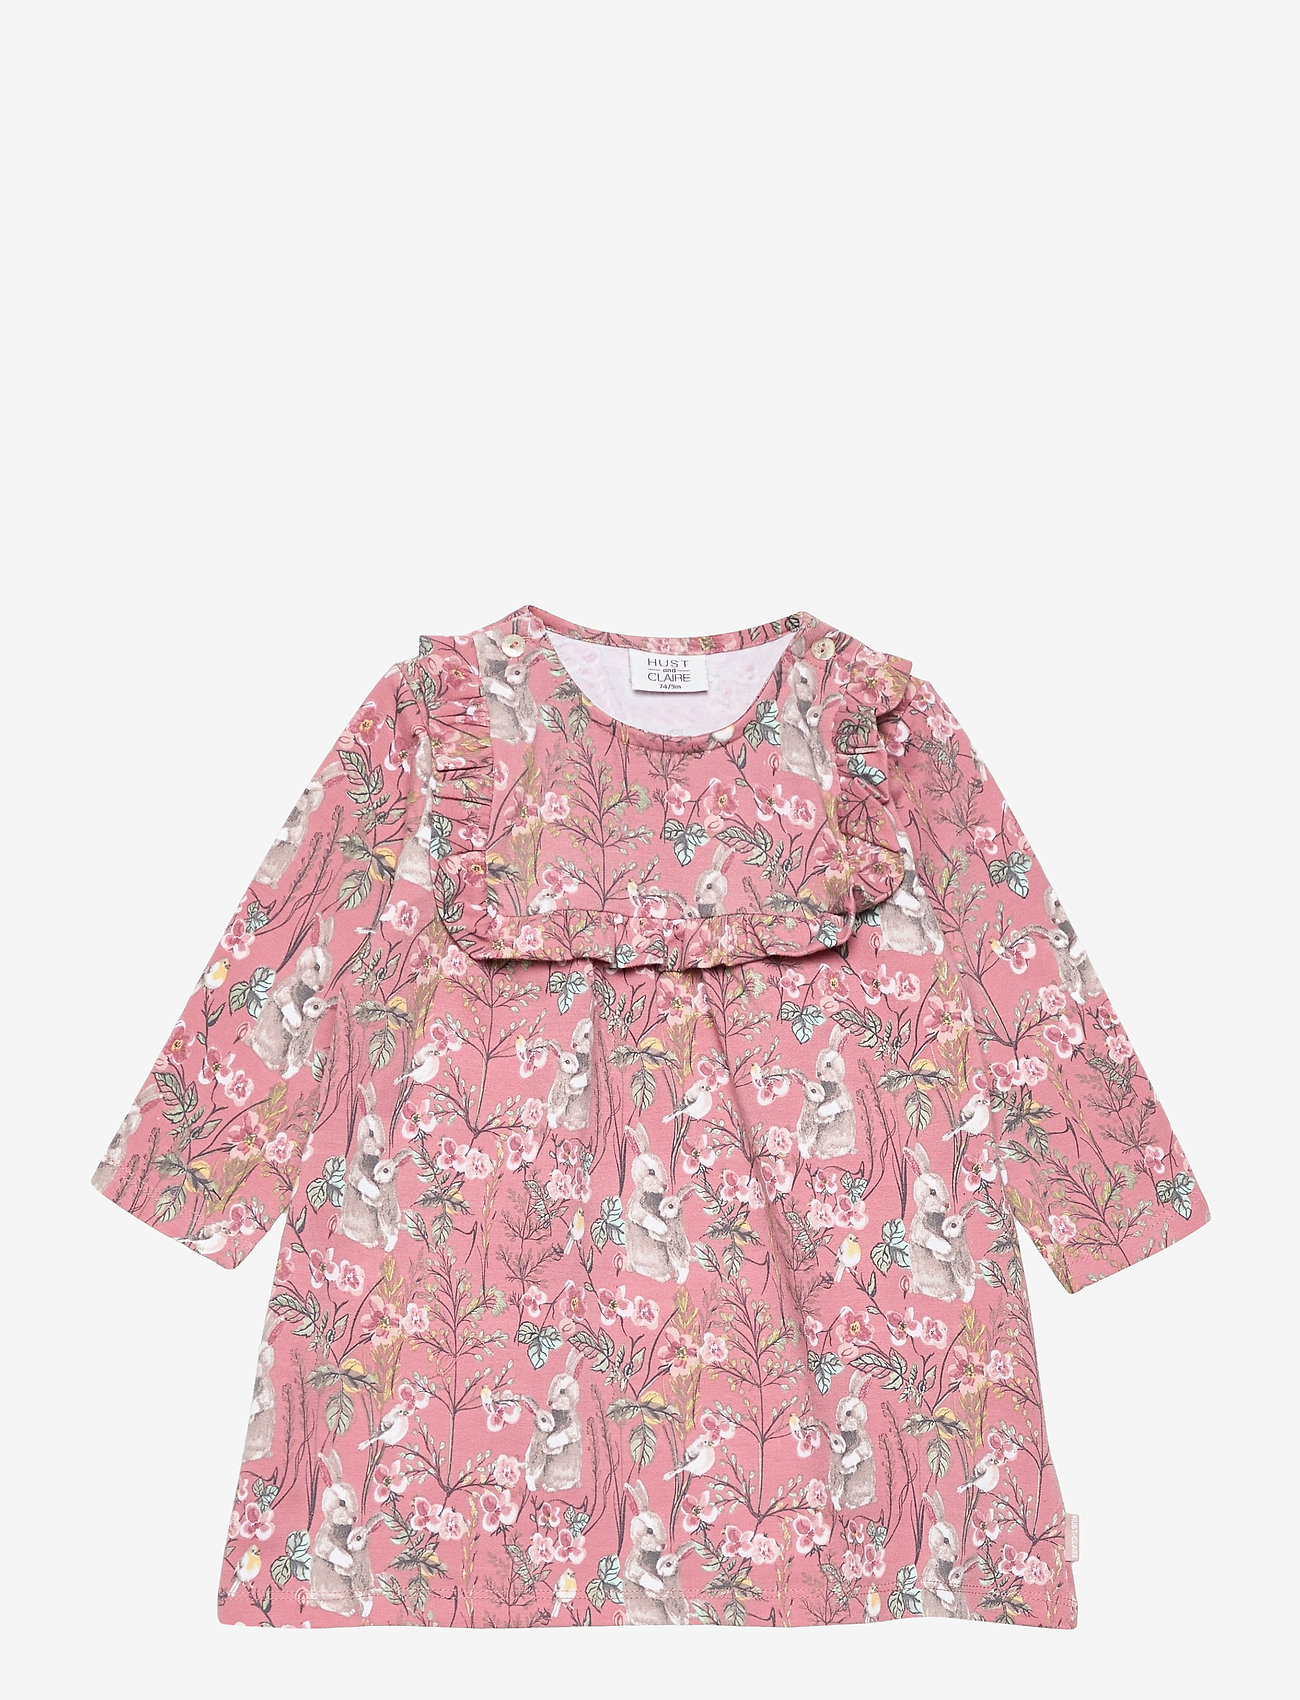 Hust & Claire - Karenlil - Dress - kleider - old rosie - 0